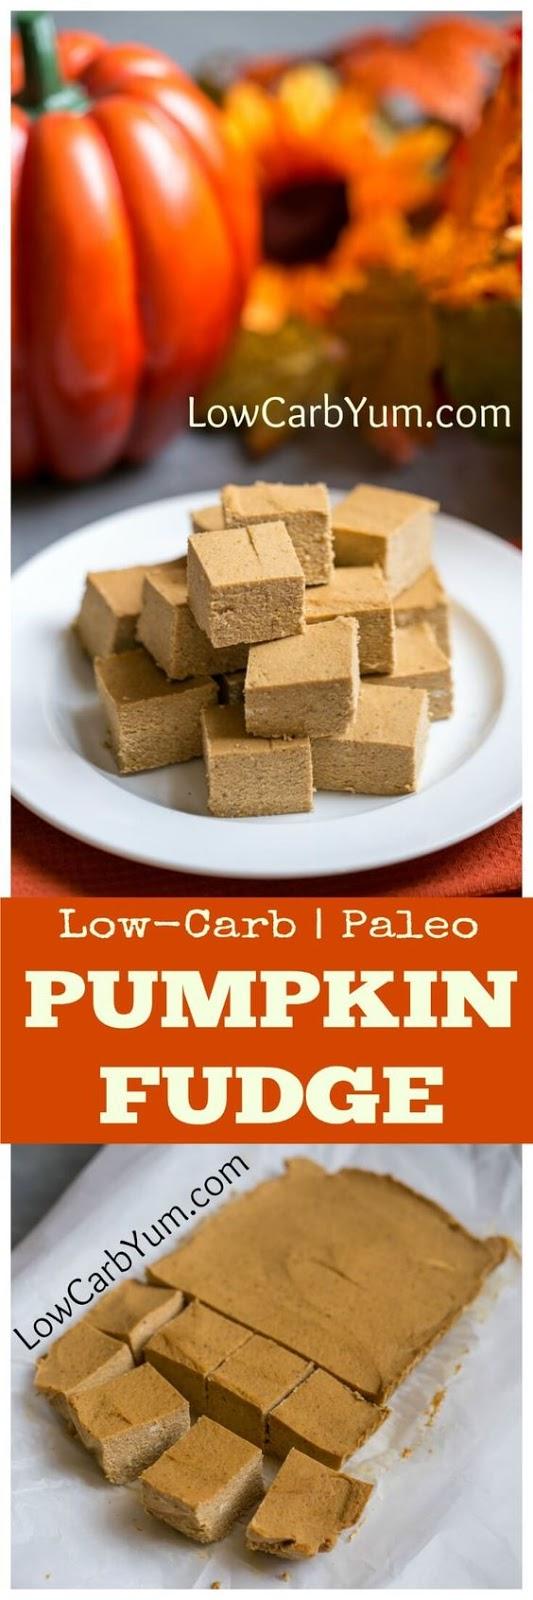 Easy Pumpkin Fudge Recipe - Paleo